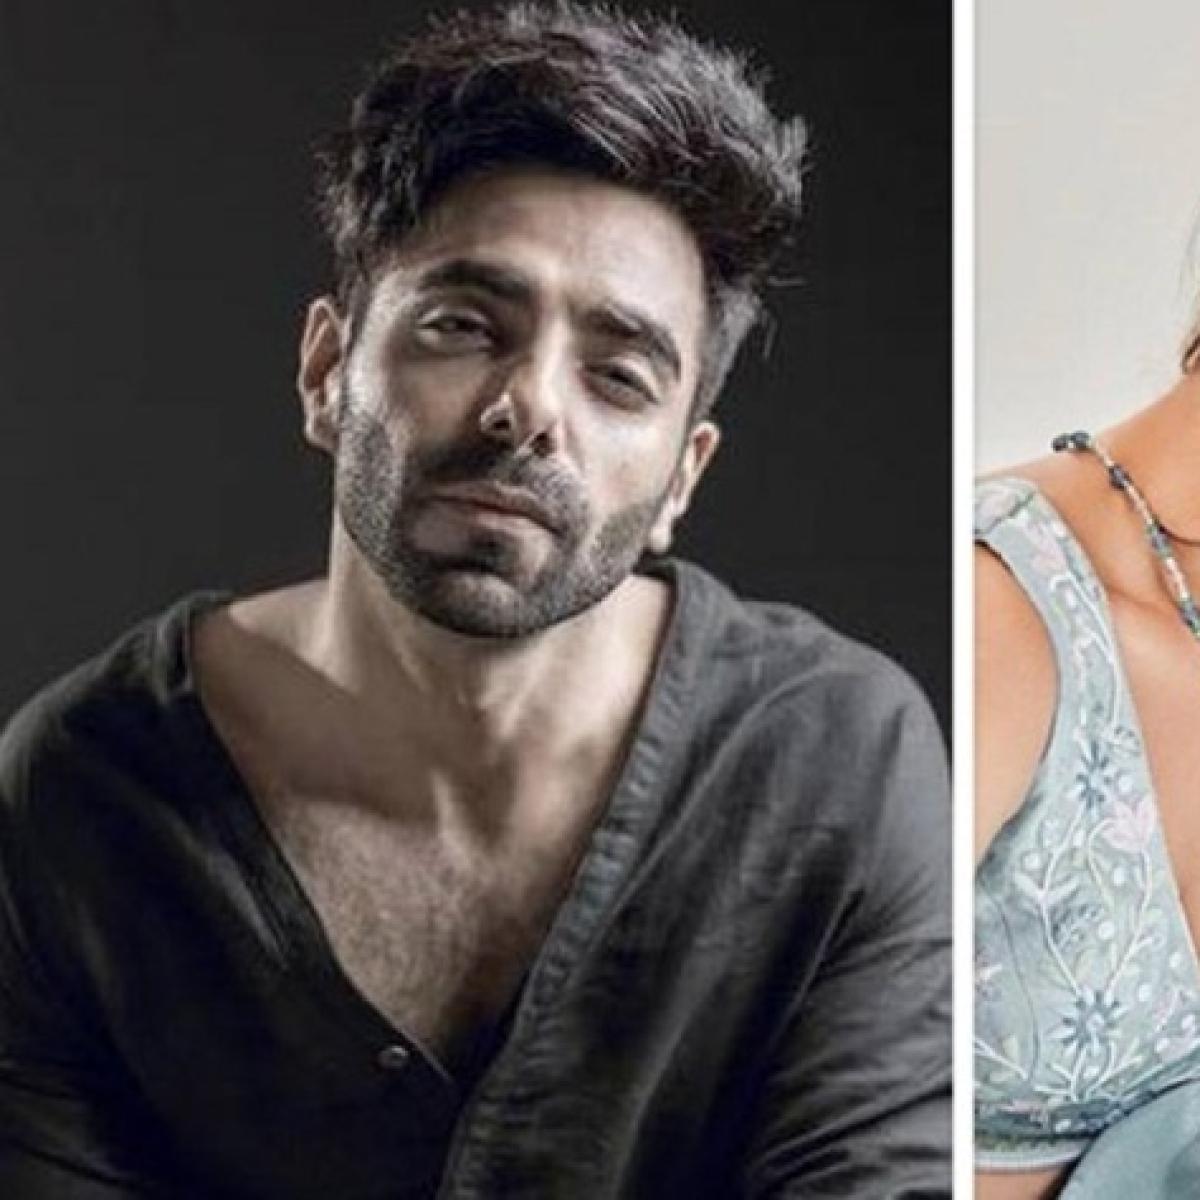 Aparshakti Khurrana bags his first lead role opposite Pranutan Bahl in 'Helmet'